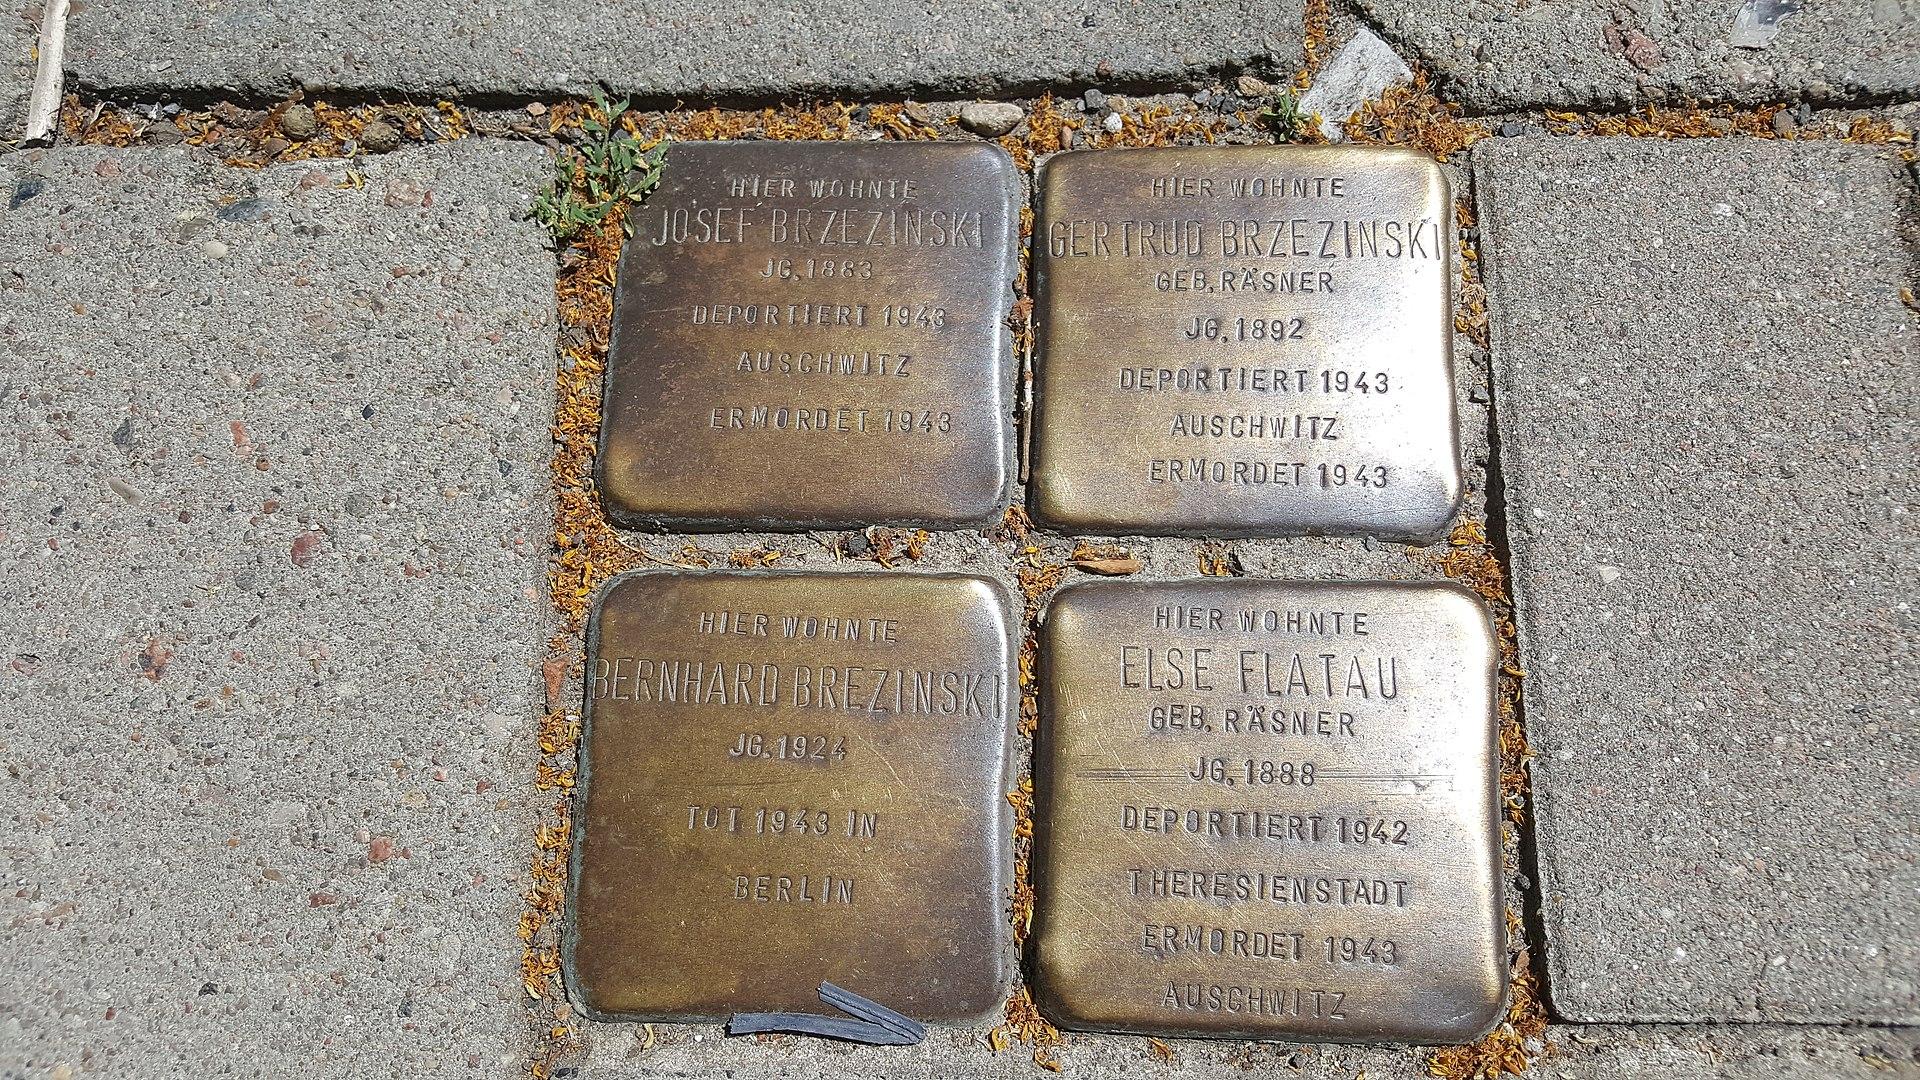 Stolperstein Josef,Gertrud,Bernhard Brezinski , Else Flatau.jpg